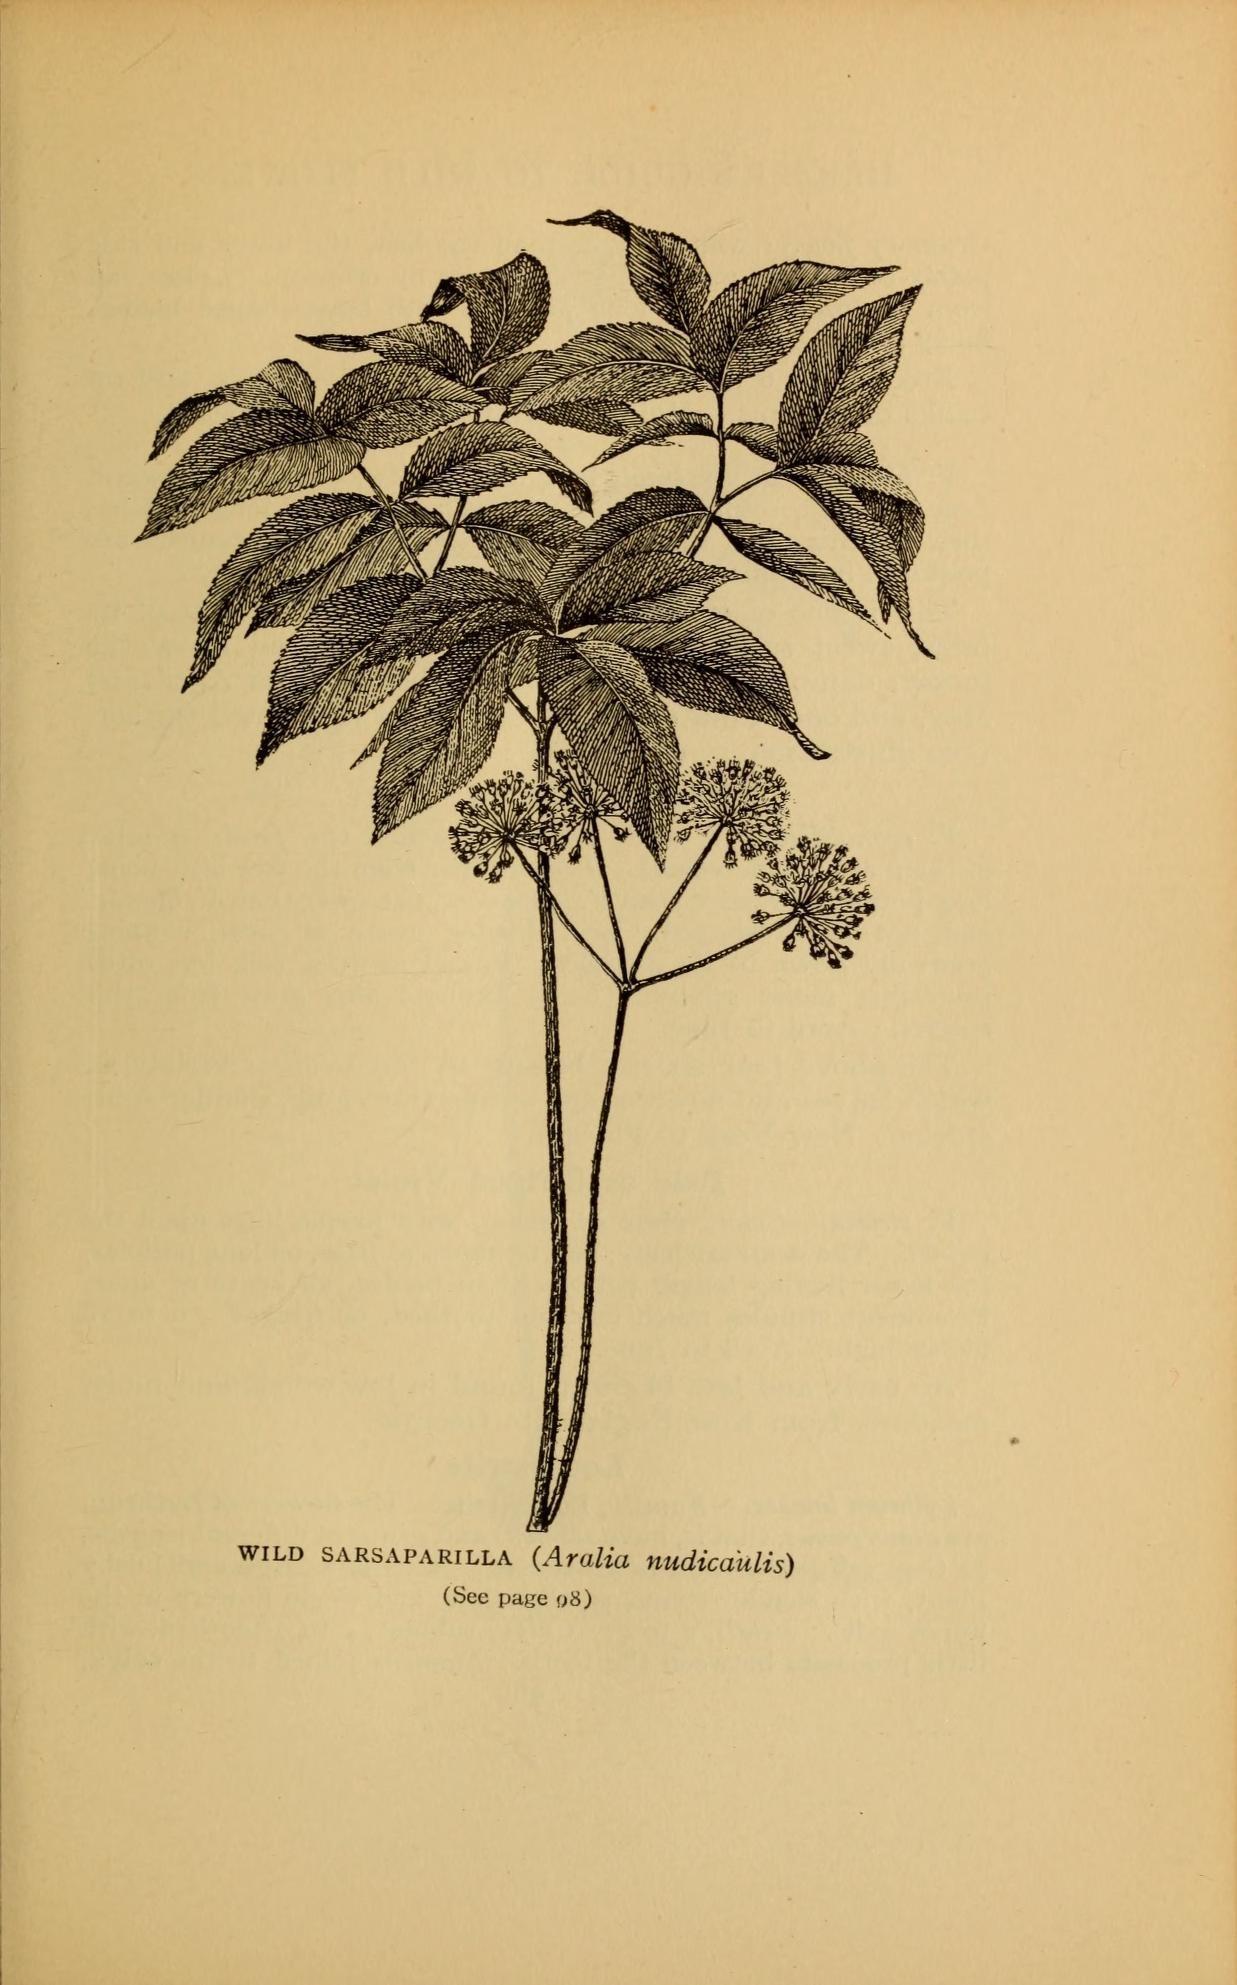 An Old Illustration of Wild Sarsaparilla - Aralia Nudicaulis